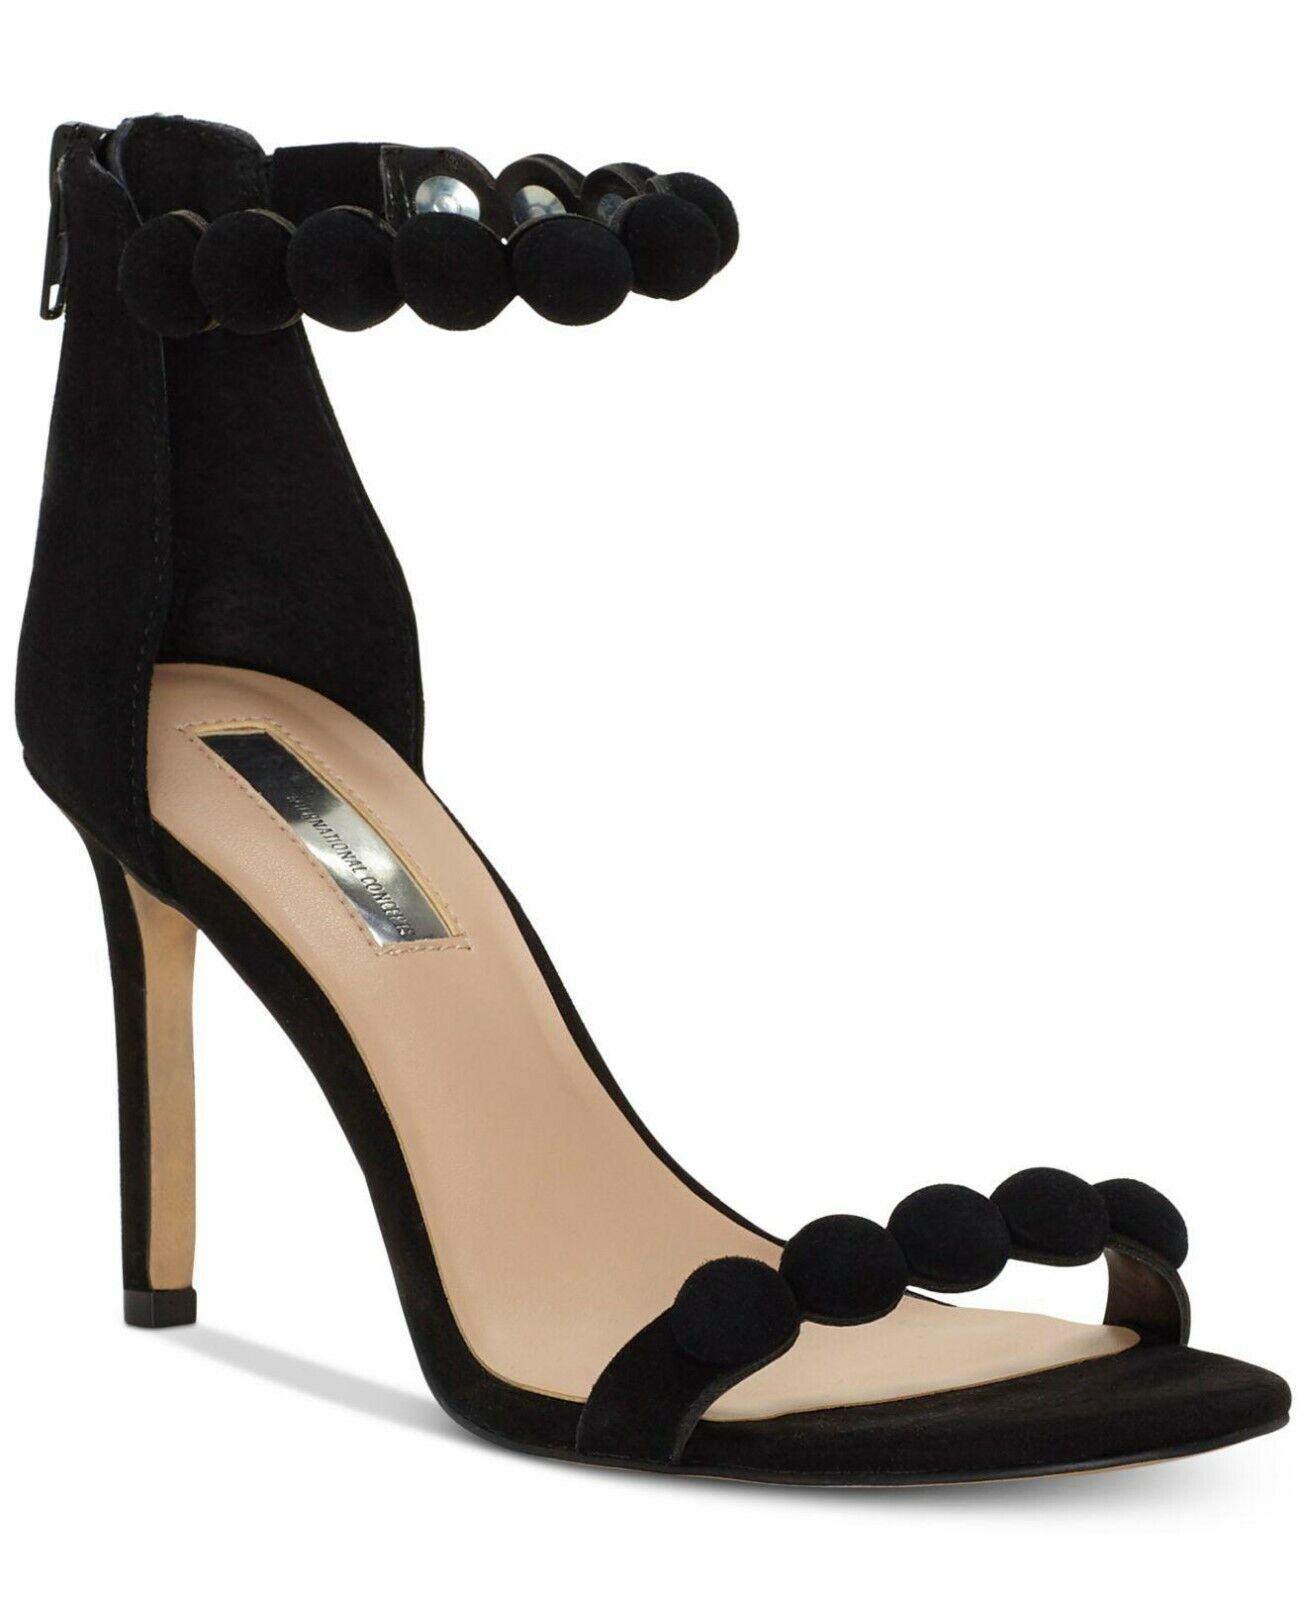 INC International Concepts Women's Gabbye Two-Piece Sandals Size 9.5M Black